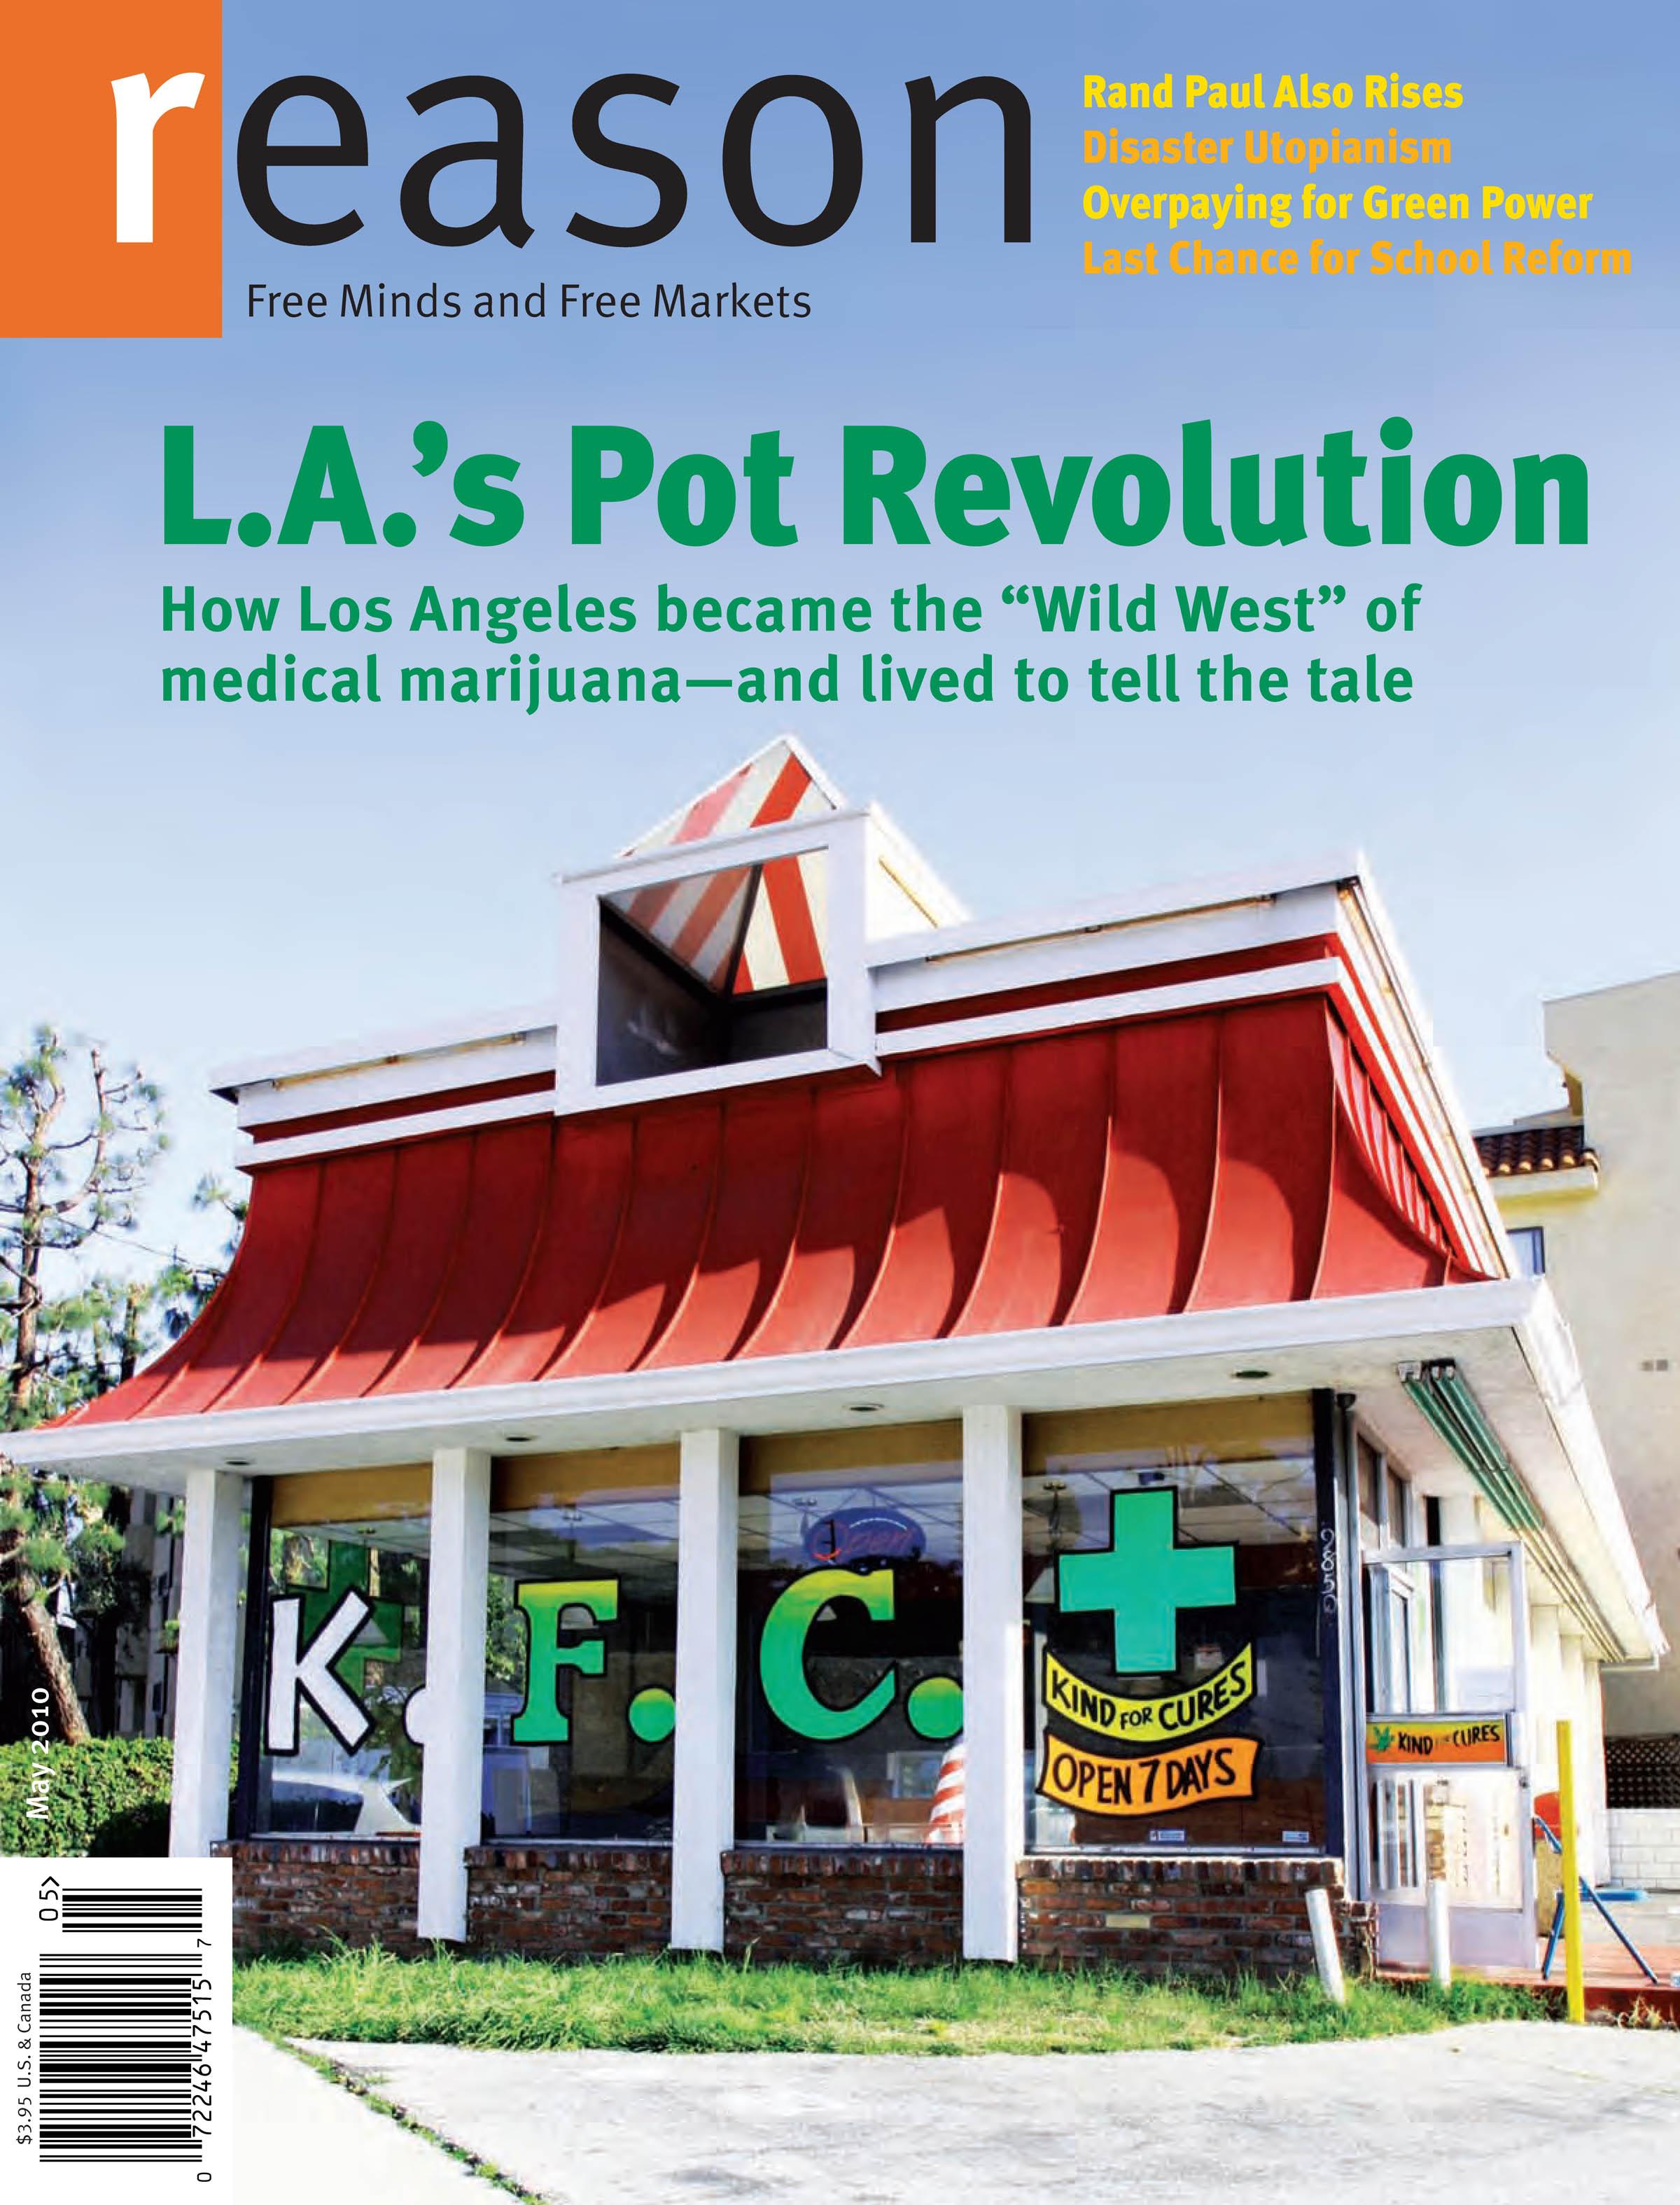 Reason Magazine, May 2010 cover image